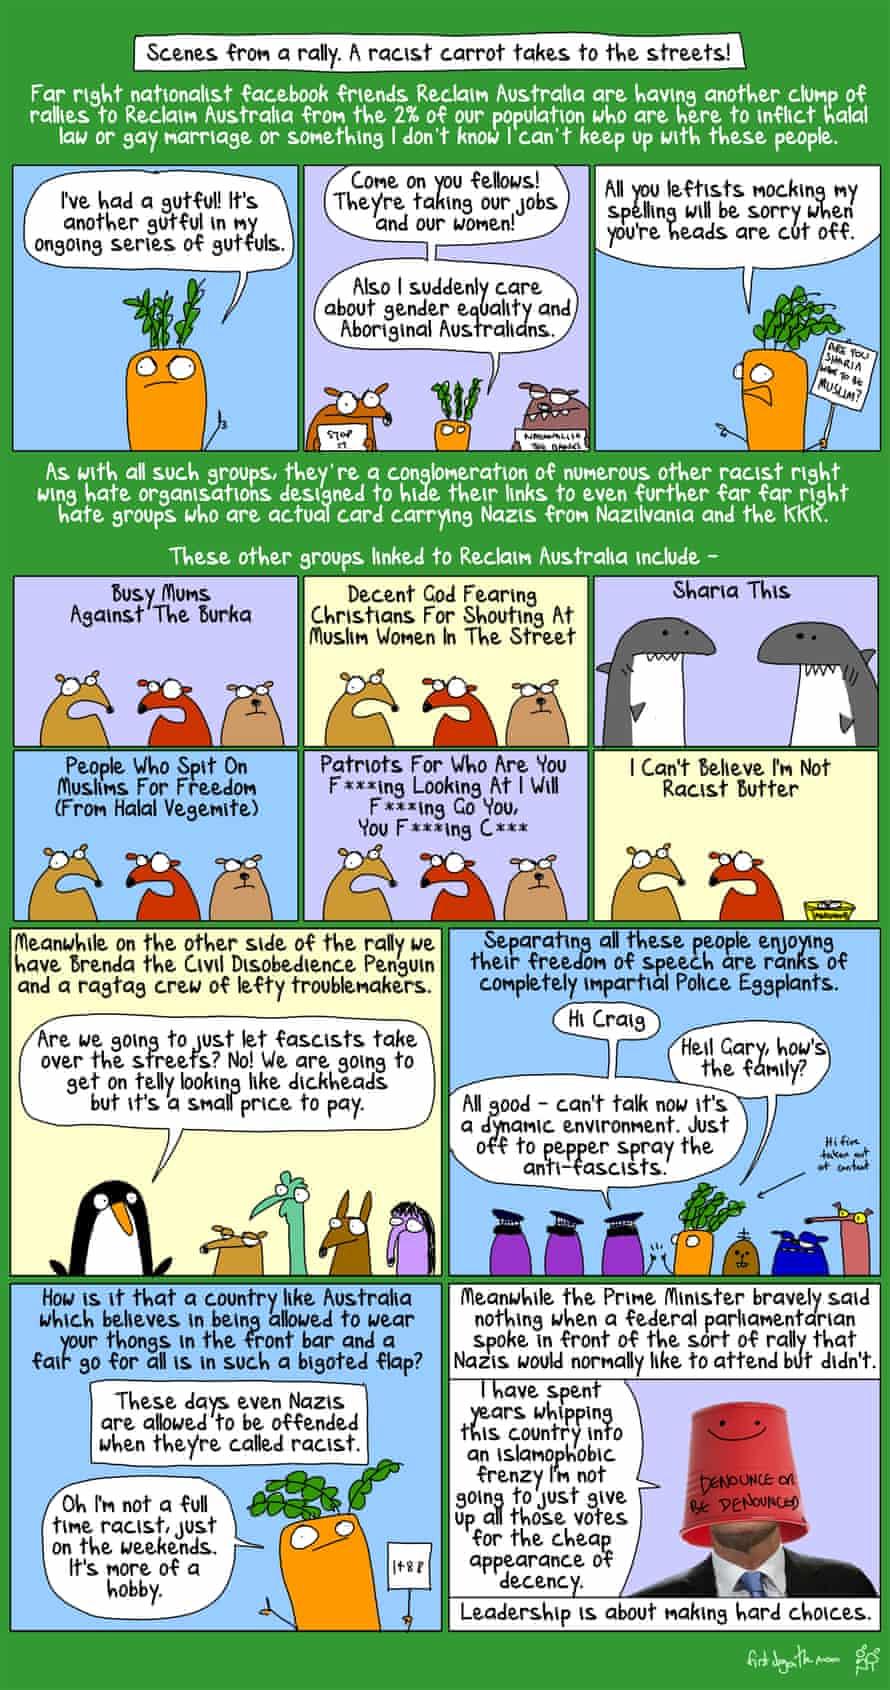 NotNeoNazis - Reclaim Australia rallies, when a racist carrot met Brenda the Civil Disobedience Penguin